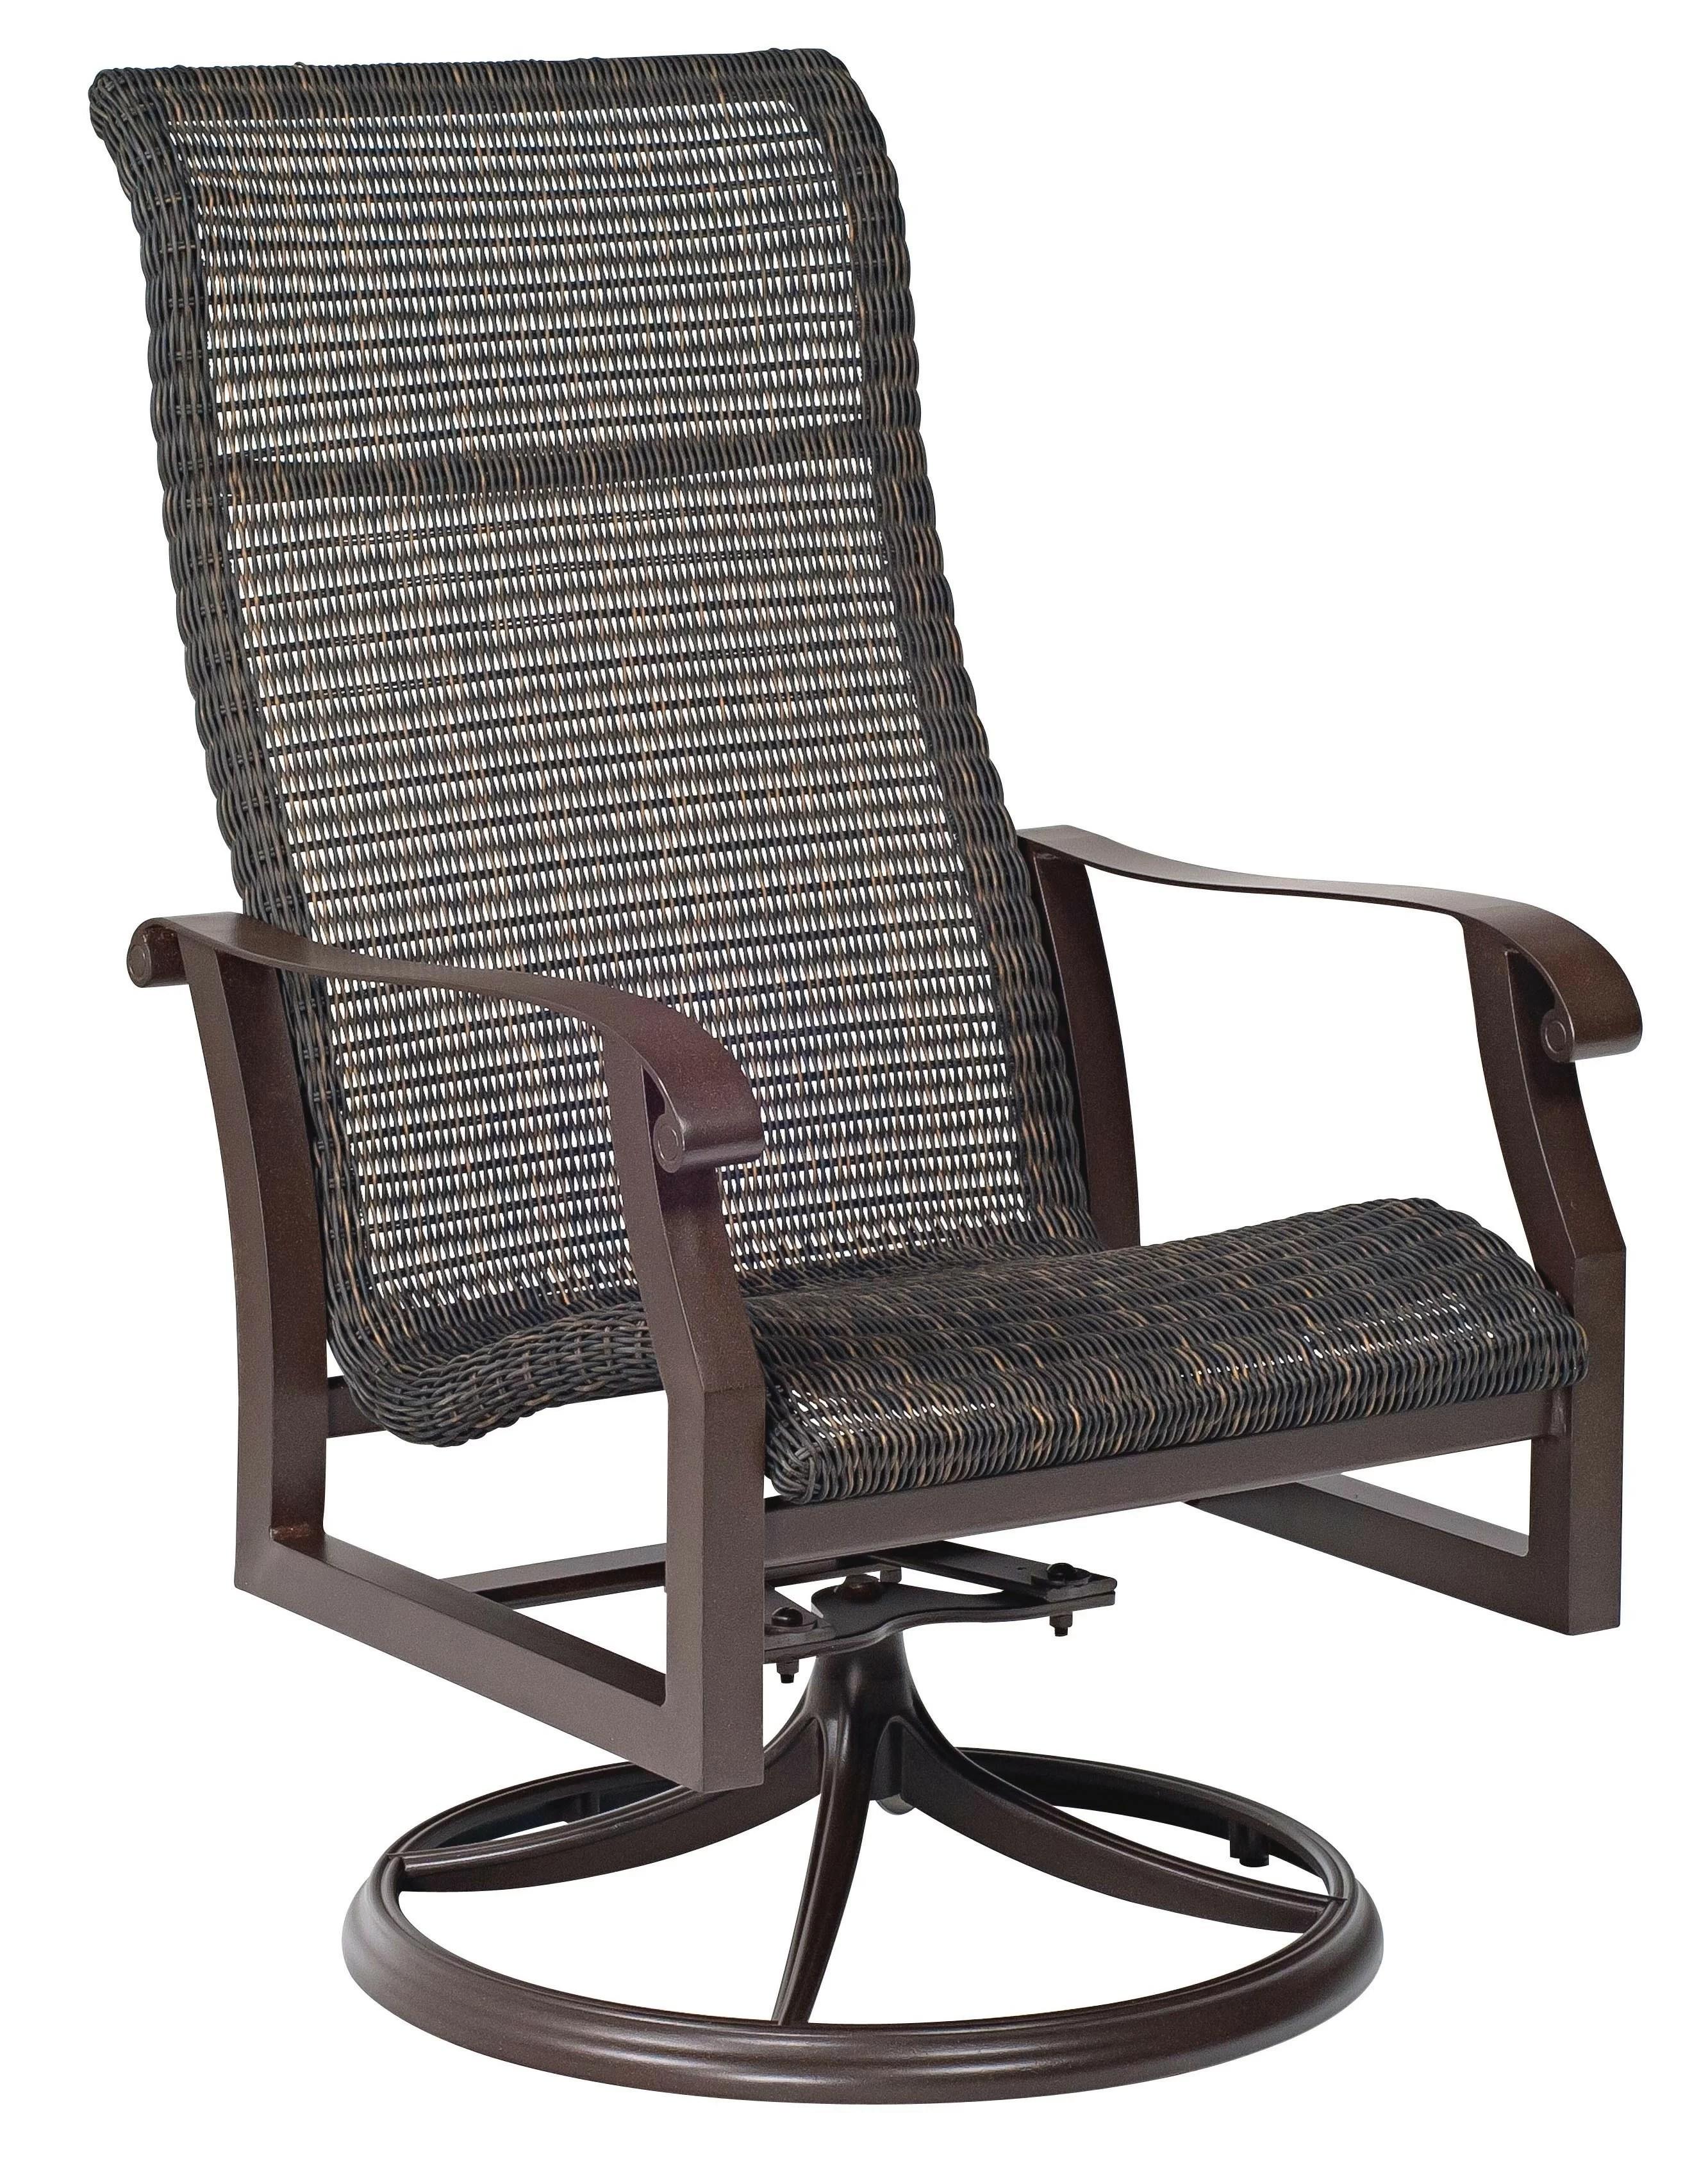 Woodard Cortland Woven High Back Swivel Rocking Chair Wayfair